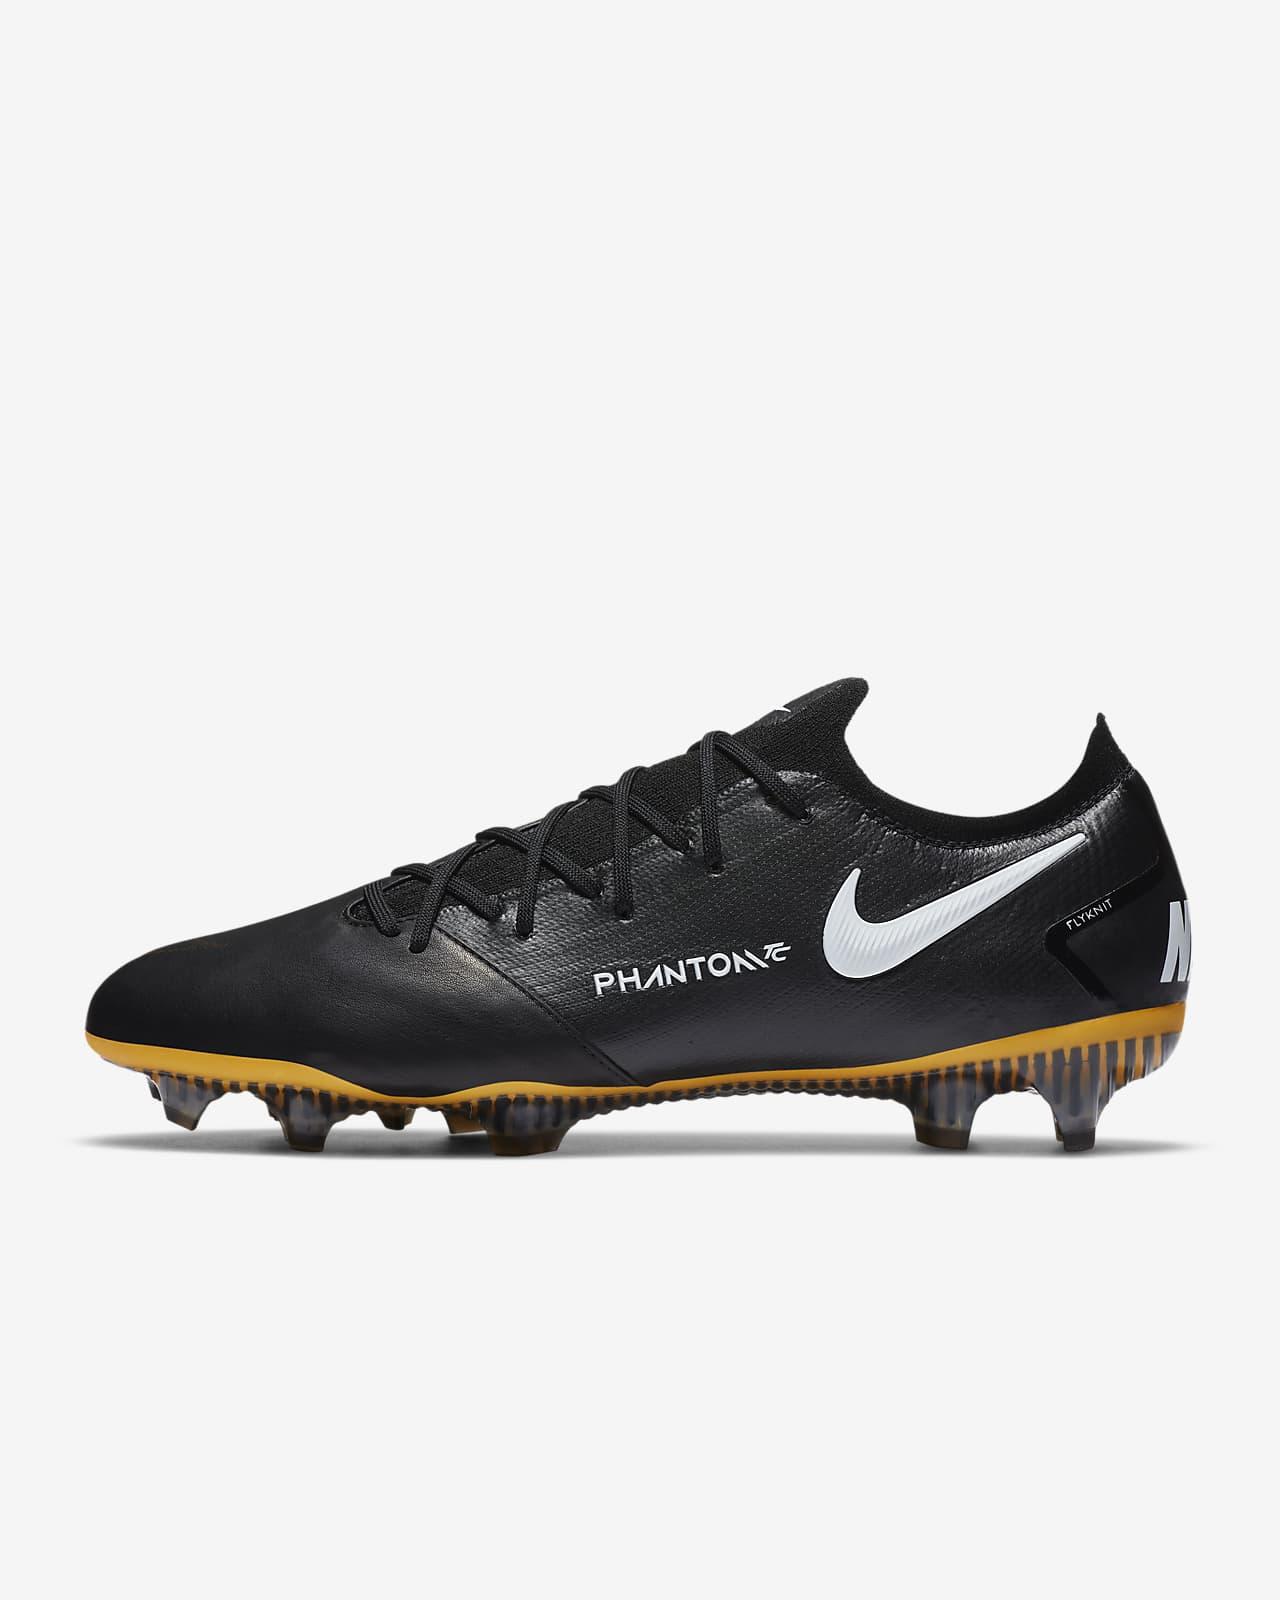 Nike Phantom GT Elite Tech Craft FG Botas de fútbol para terreno firme